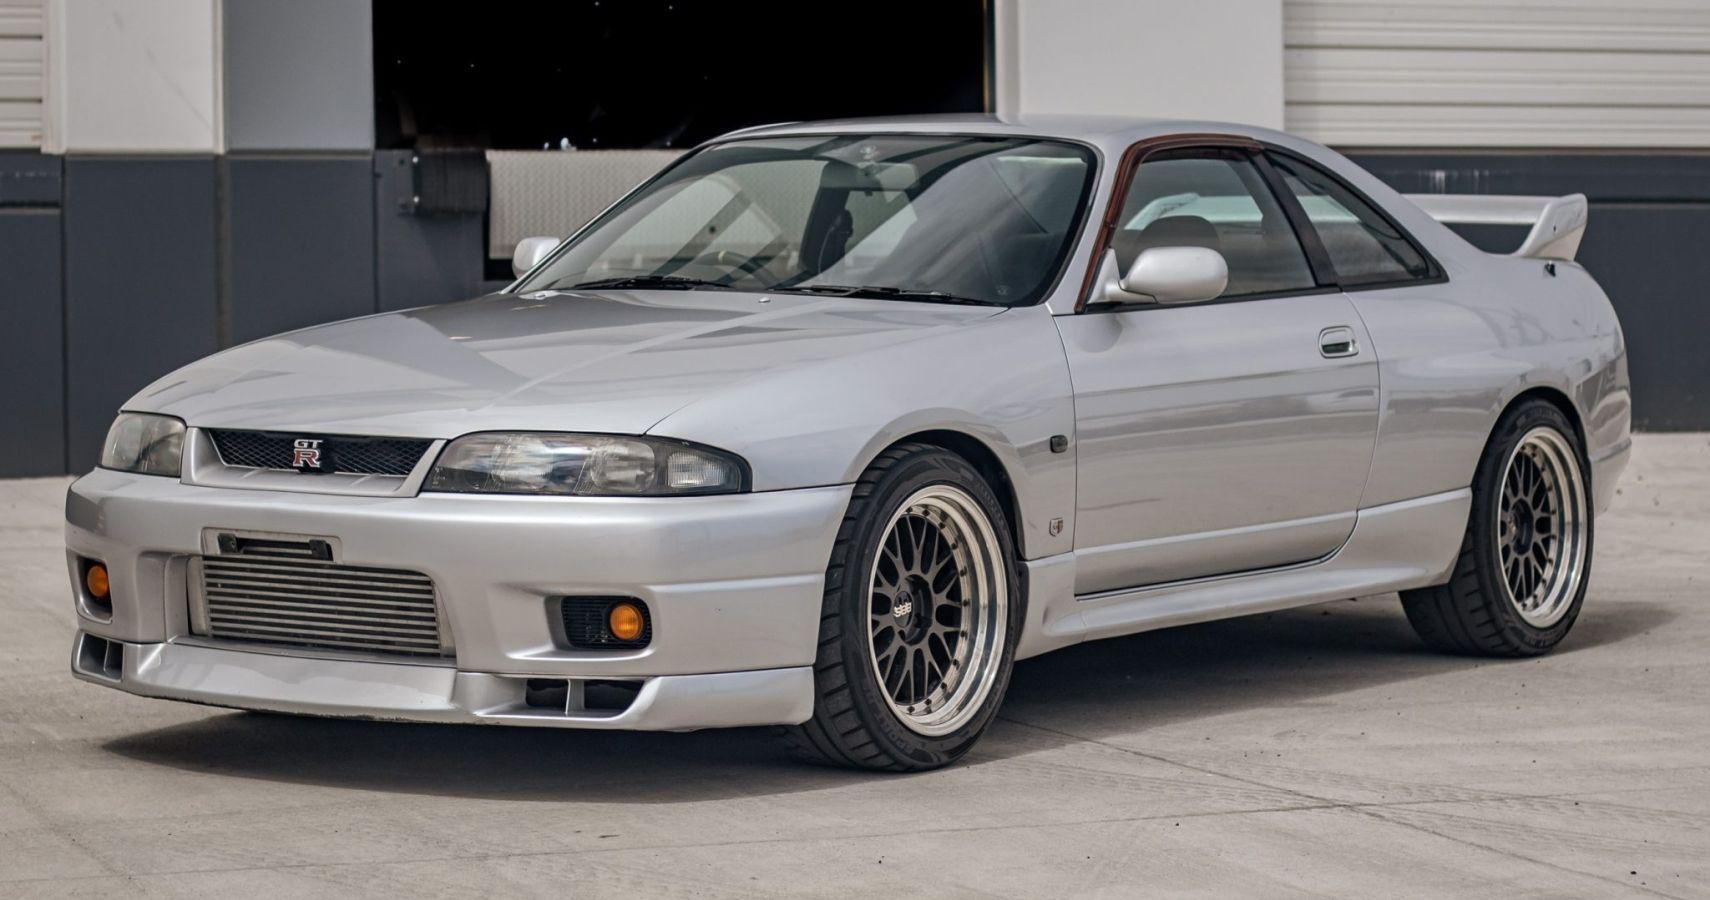 Bring A Trailer Listing A 1995 Modified Nissan Skyline GT-R V-Spec